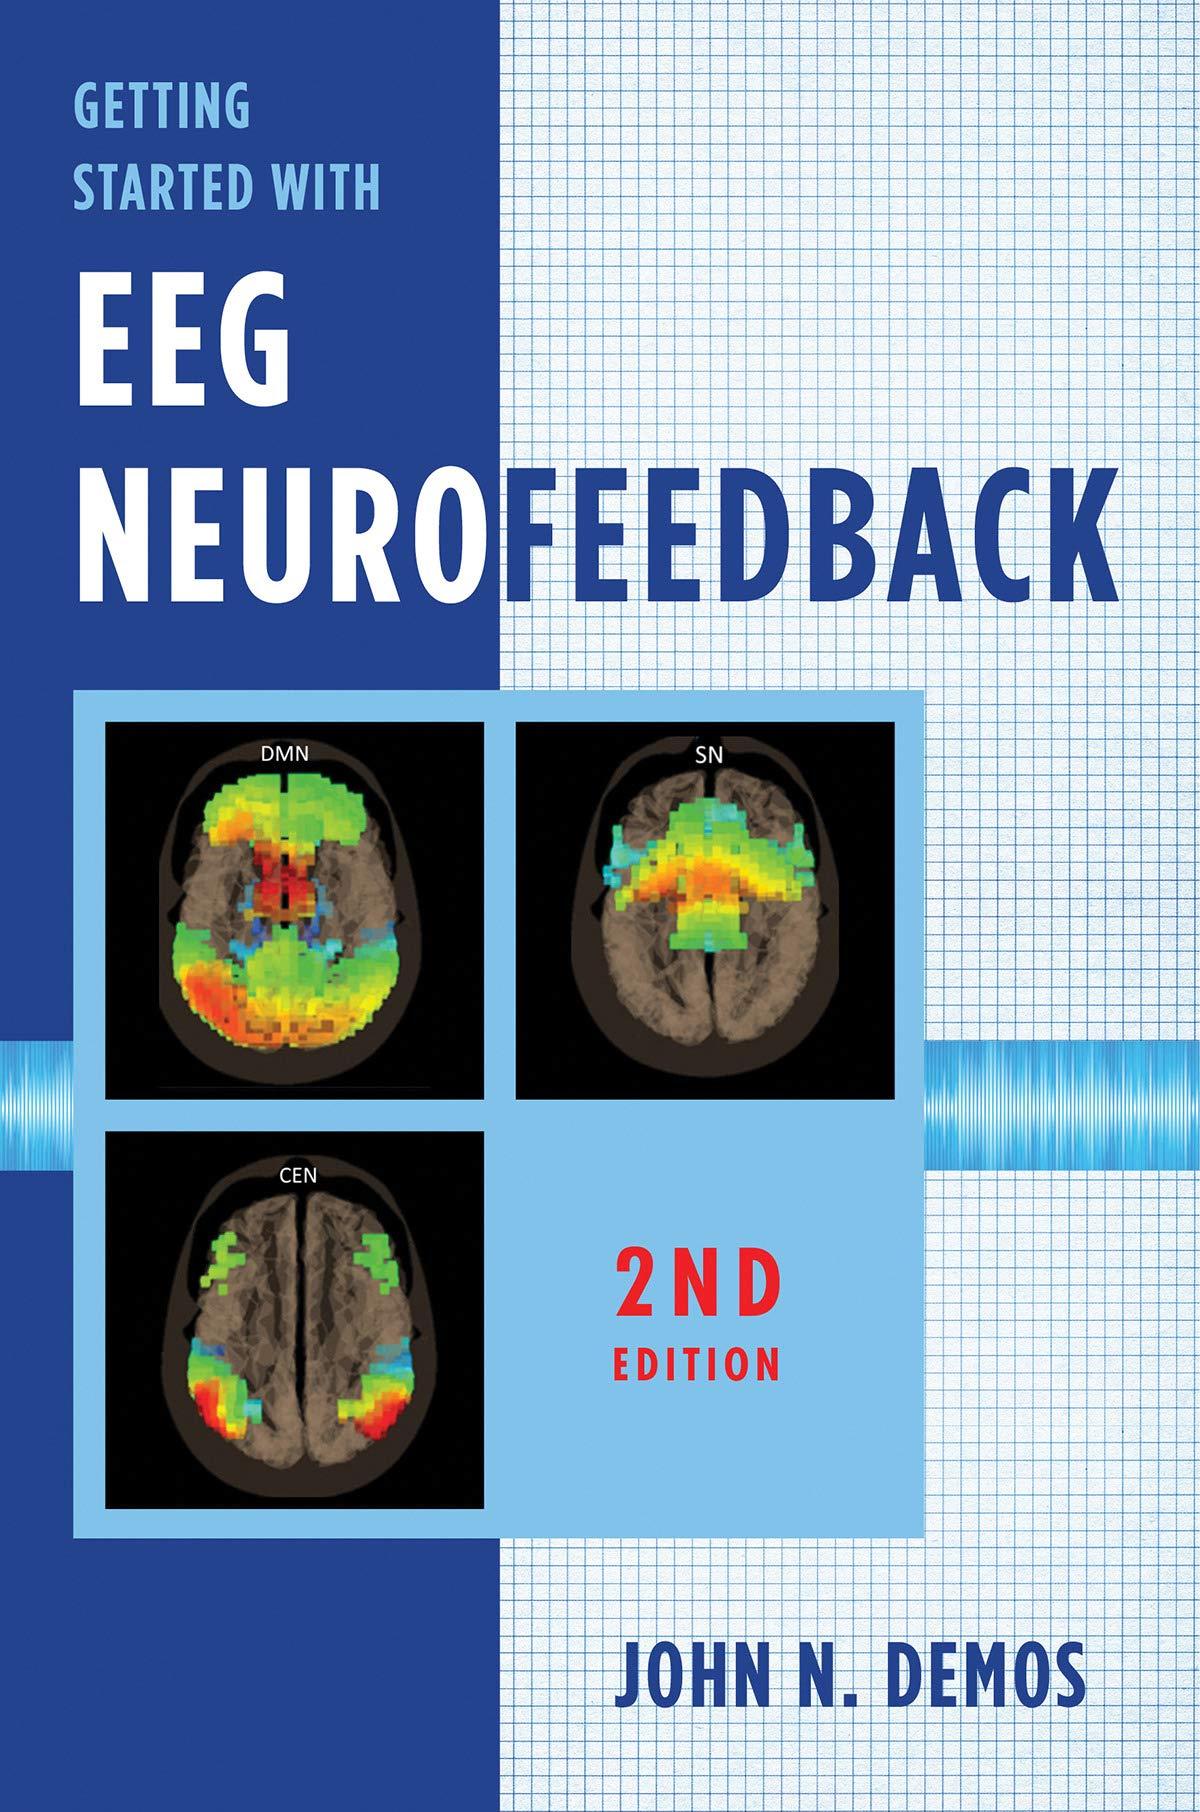 Getting Started with EEG Neurofeedback (Second Edition)